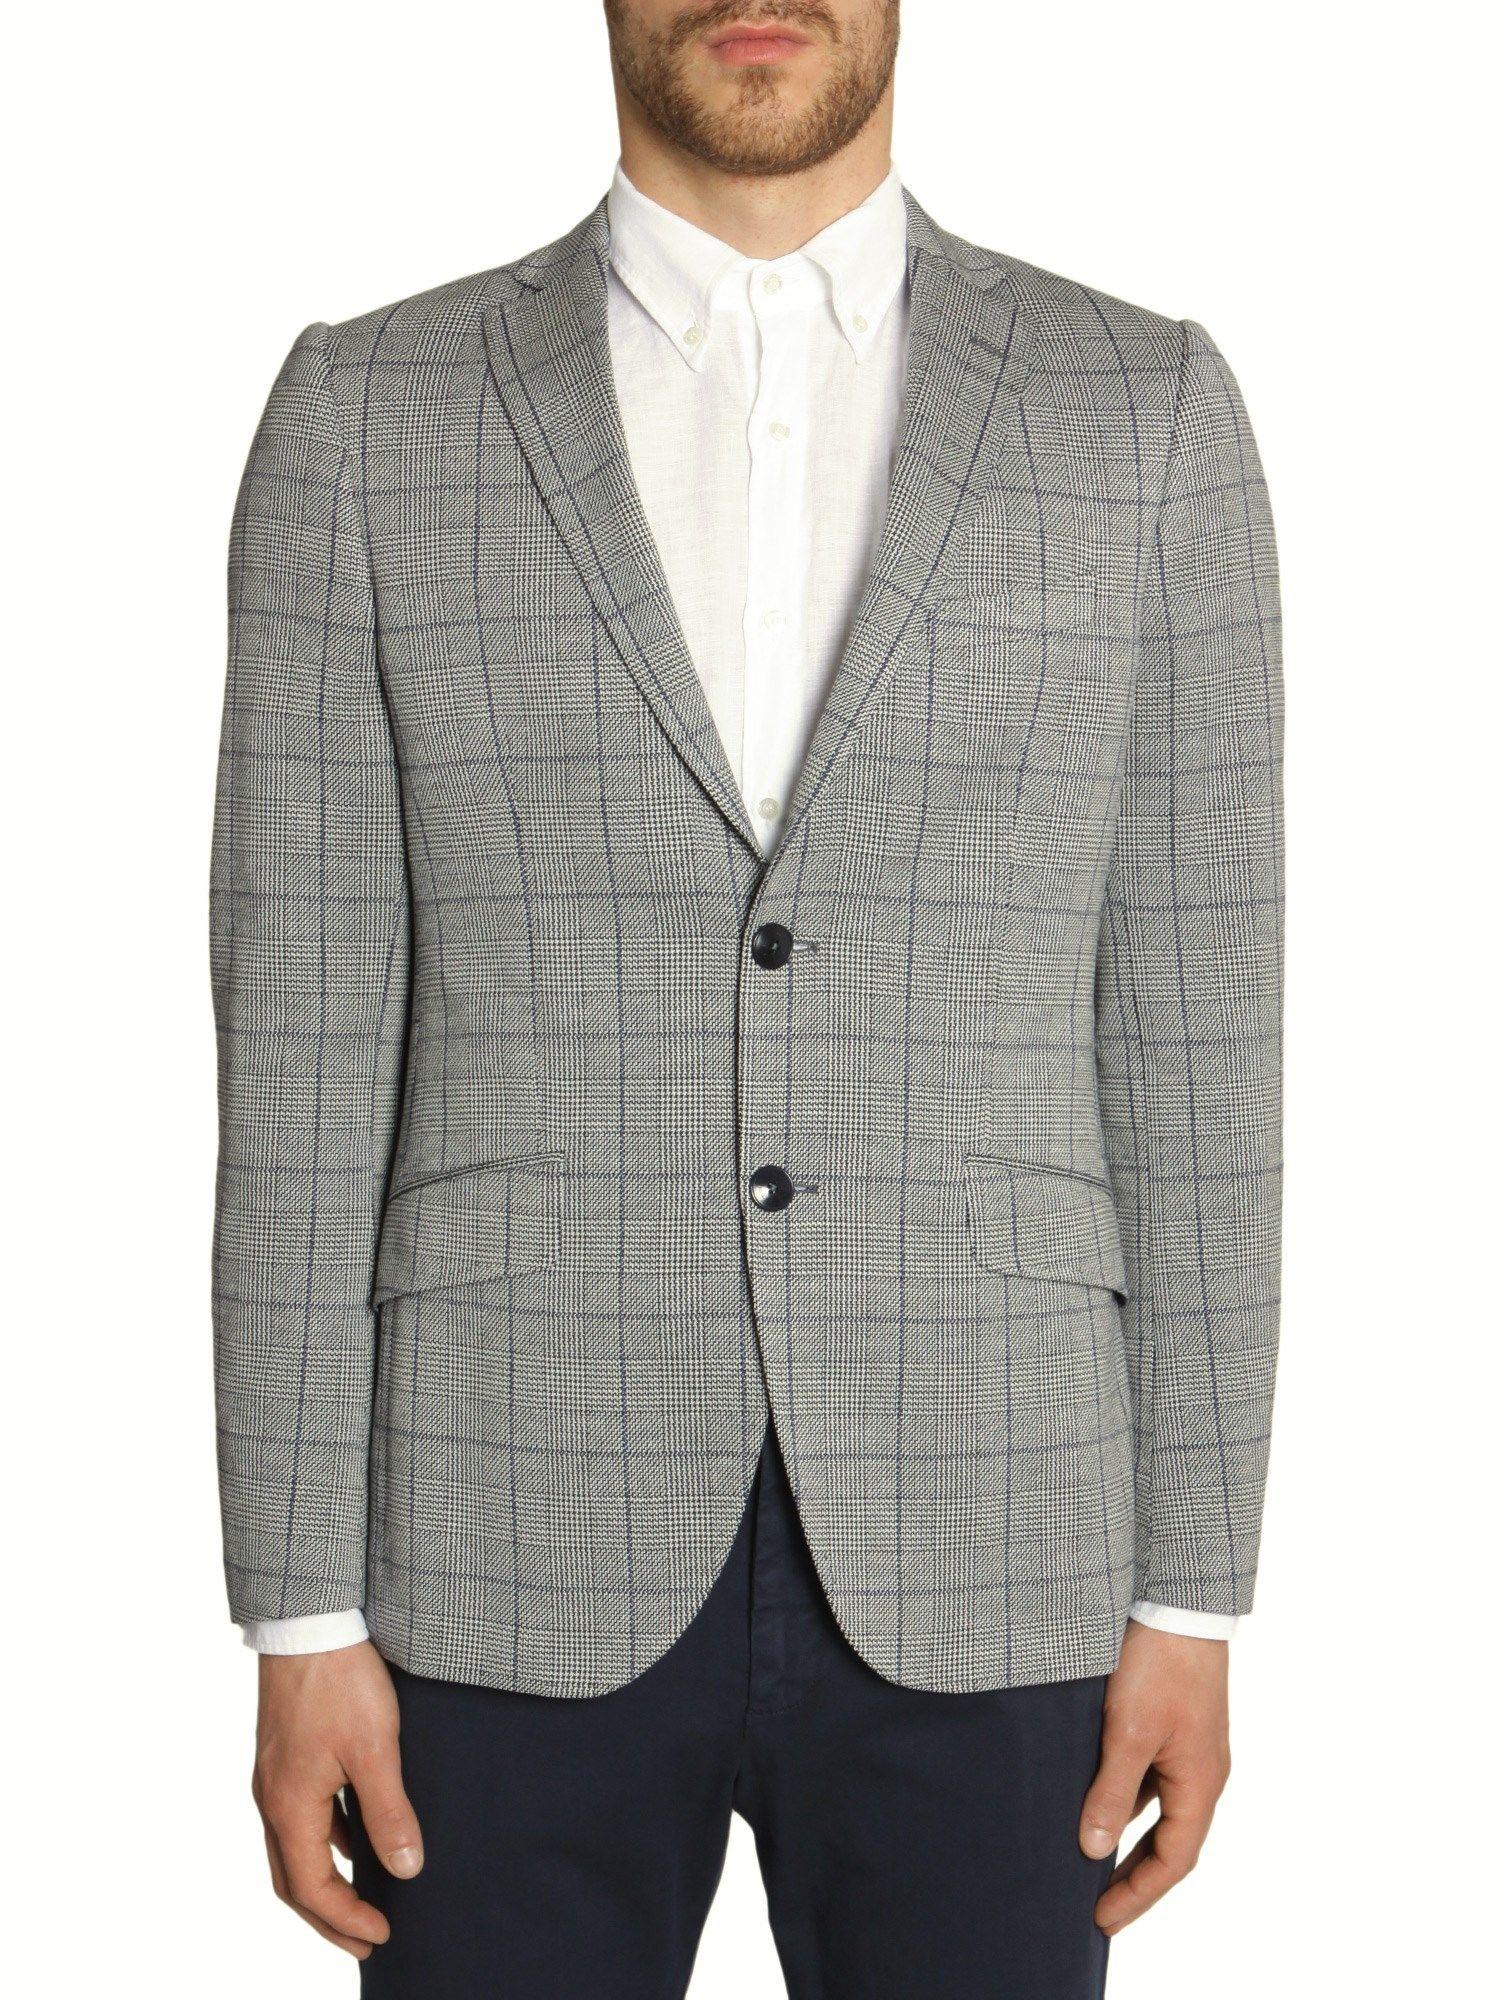 Minosse Jacket